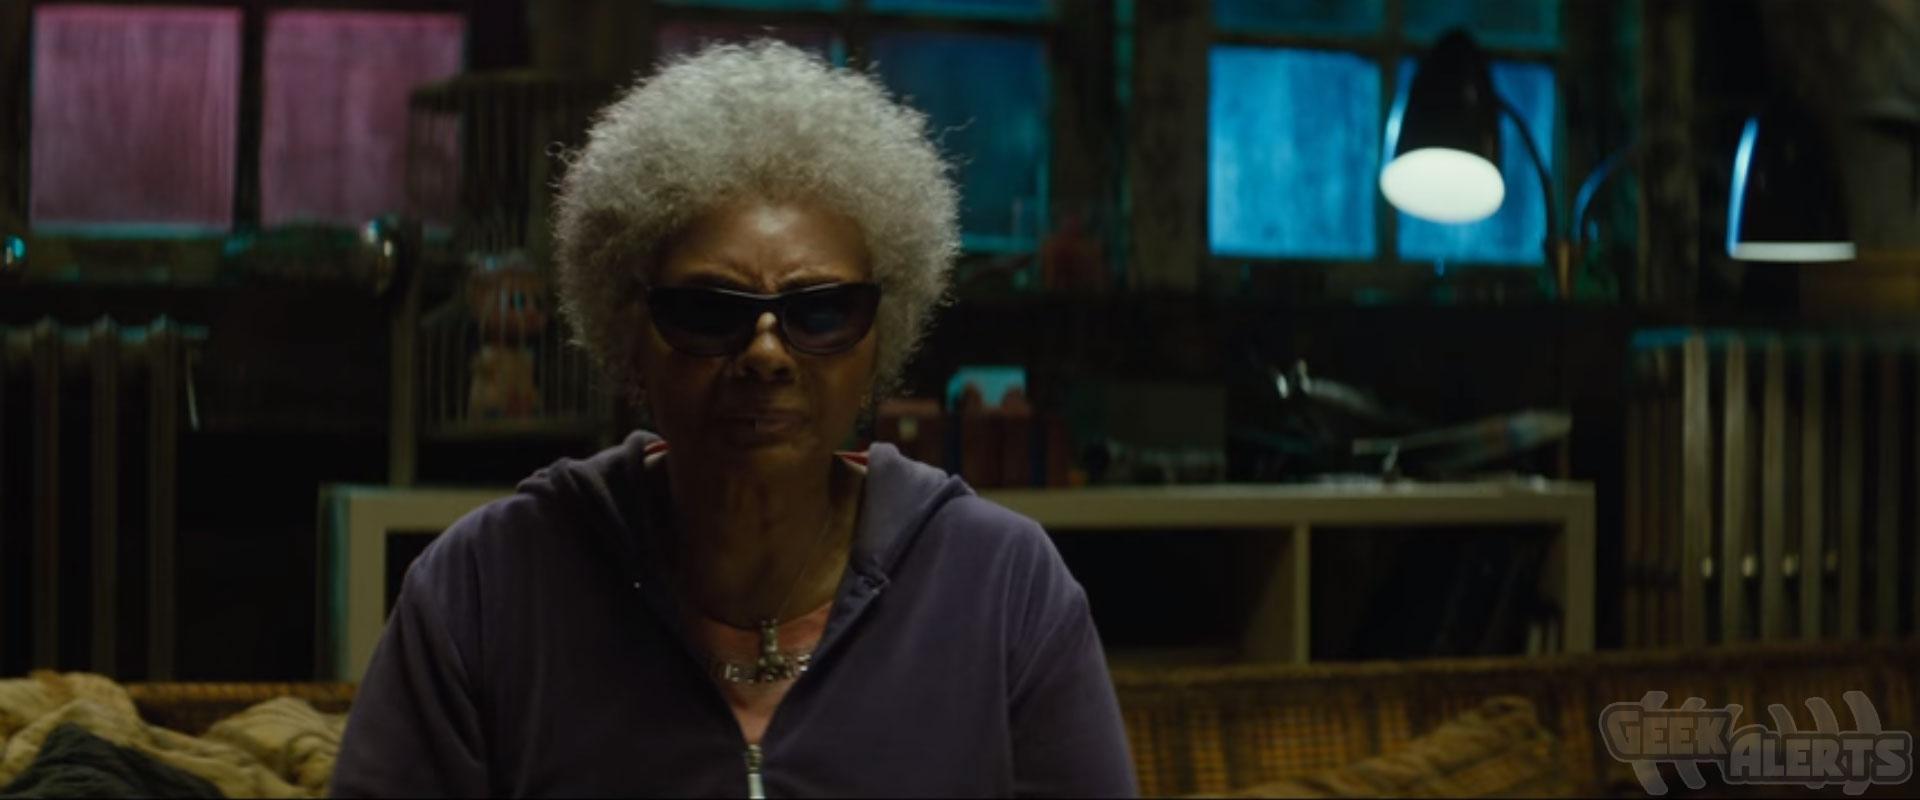 Official Deadpool 2 Trailer